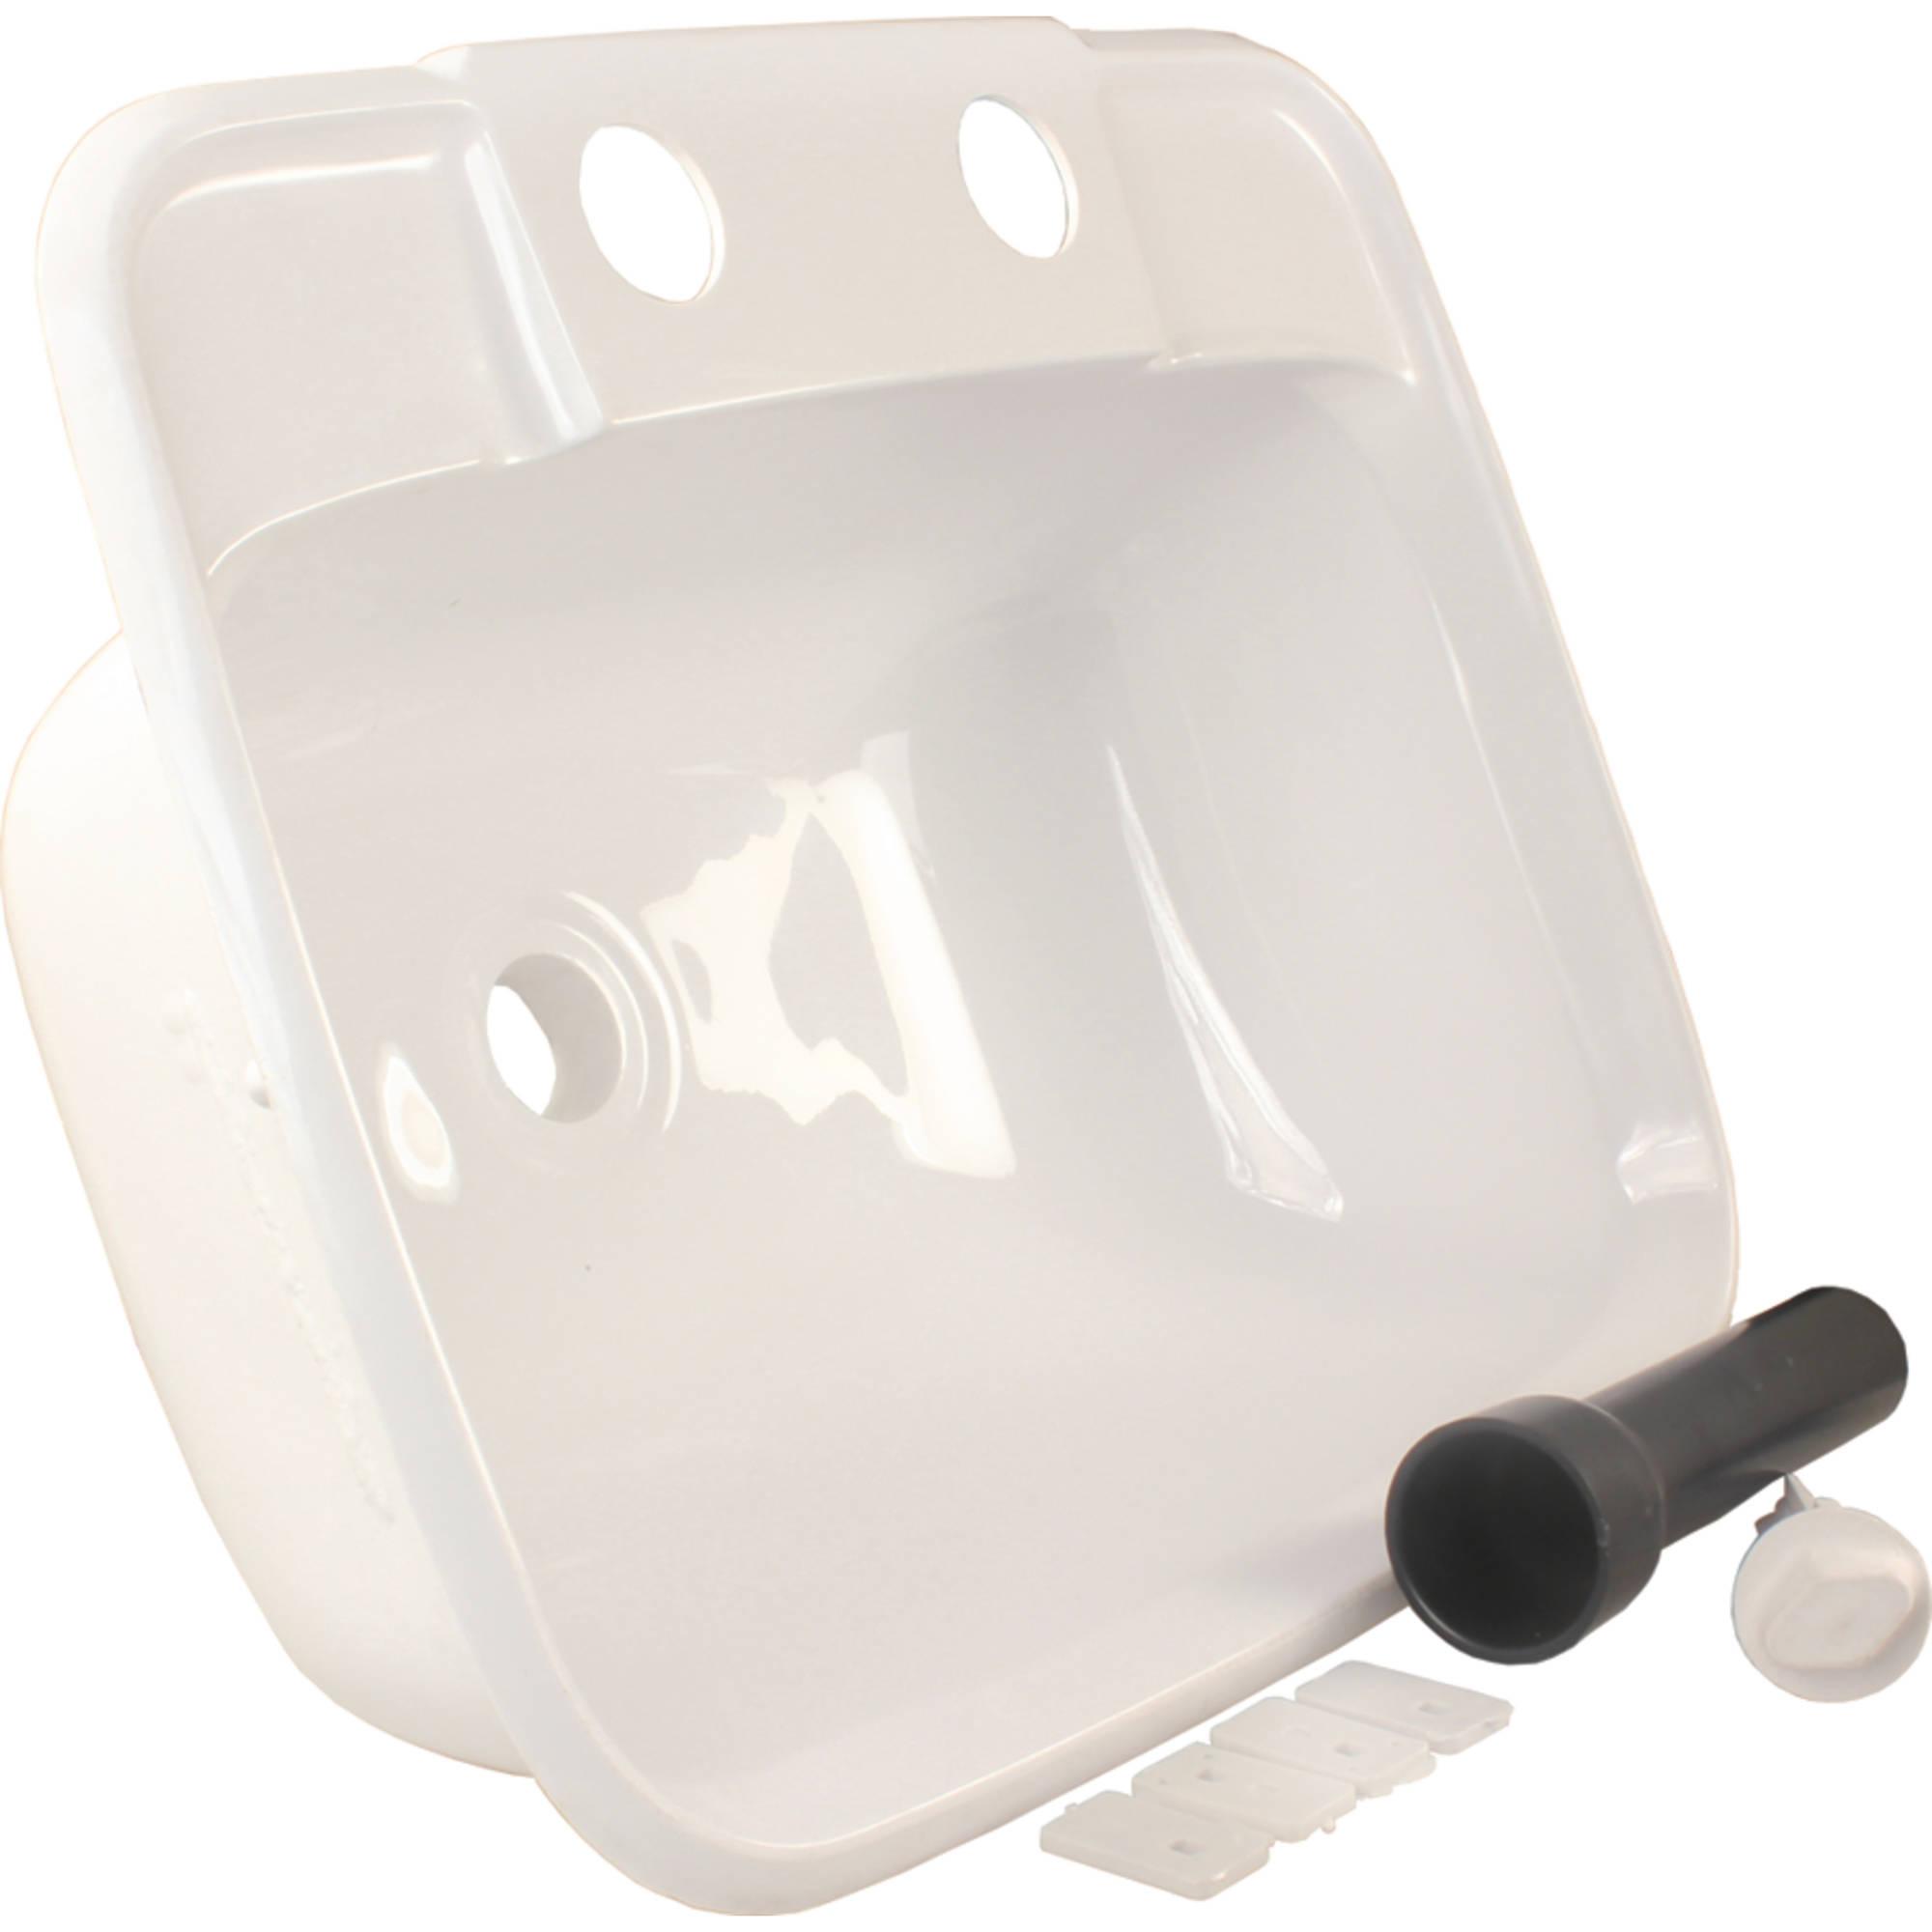 Bathroom Sinks Walmart jr products 95351 white molded rv lavatory bathroom sink - walmart